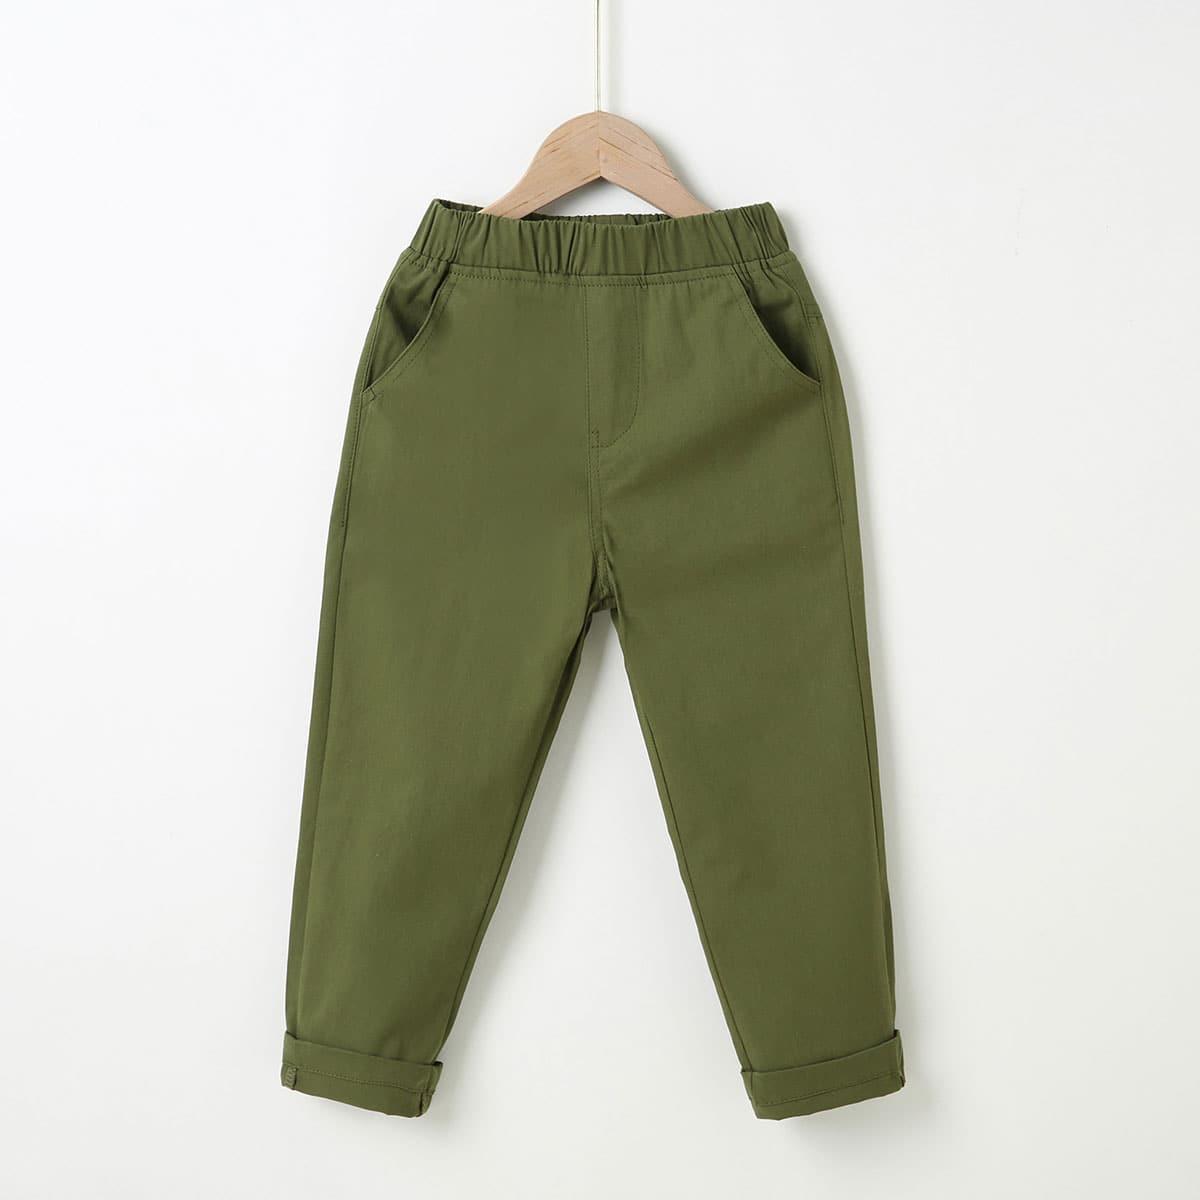 Boys Solid Elastic Waist Pants